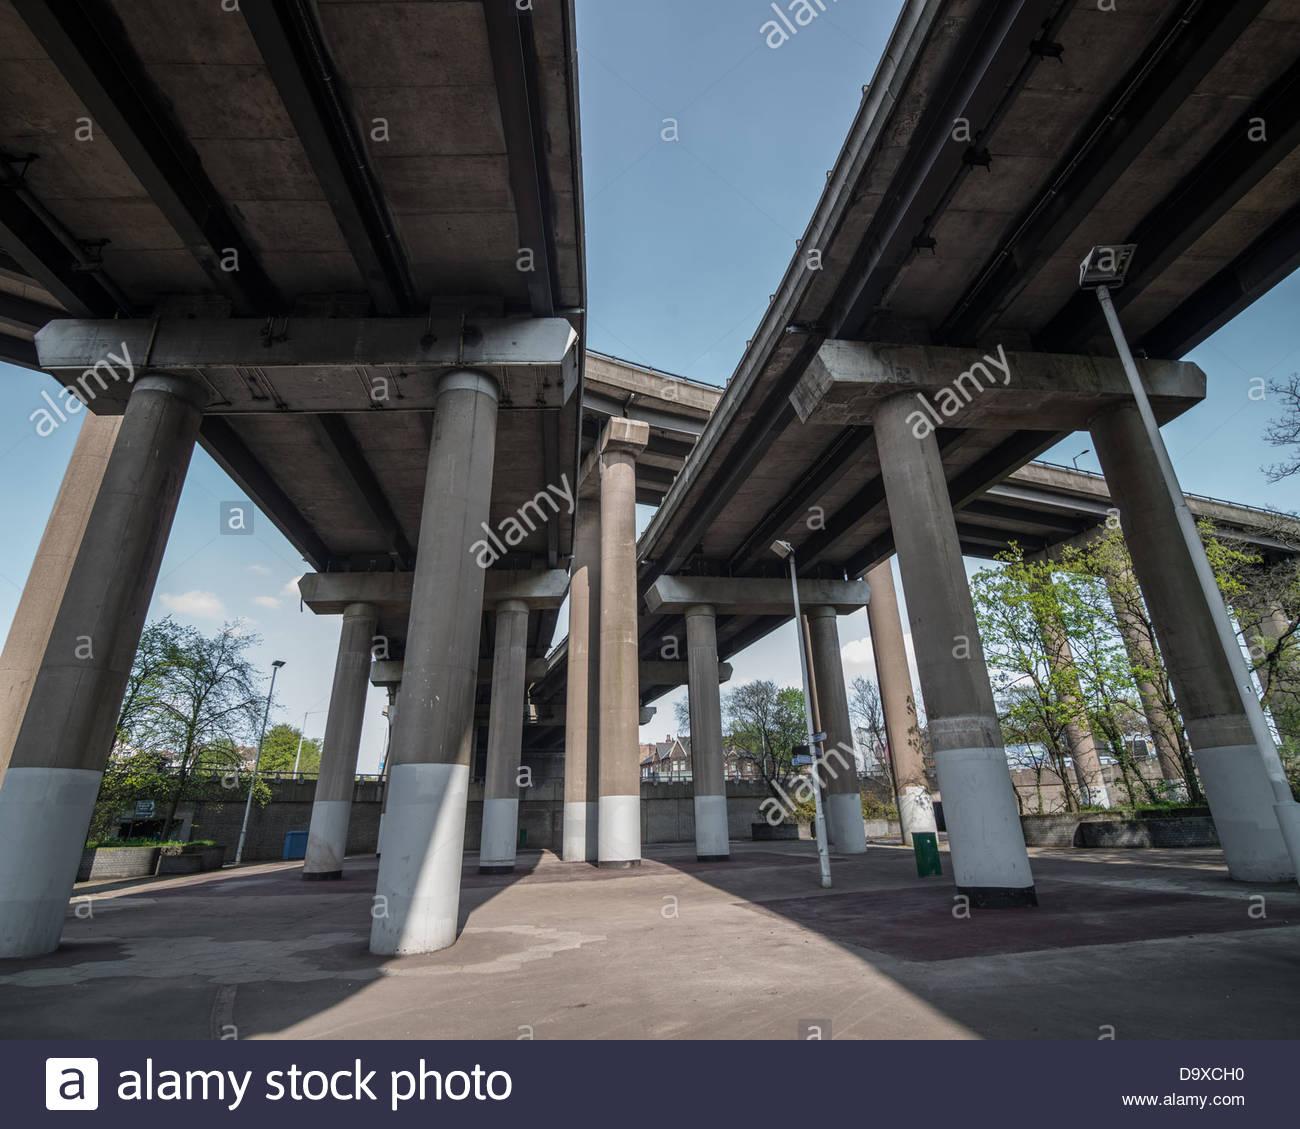 Spaghetti Junction (Gravelly Hill Interchange), West Midlands, UK - Stock Image